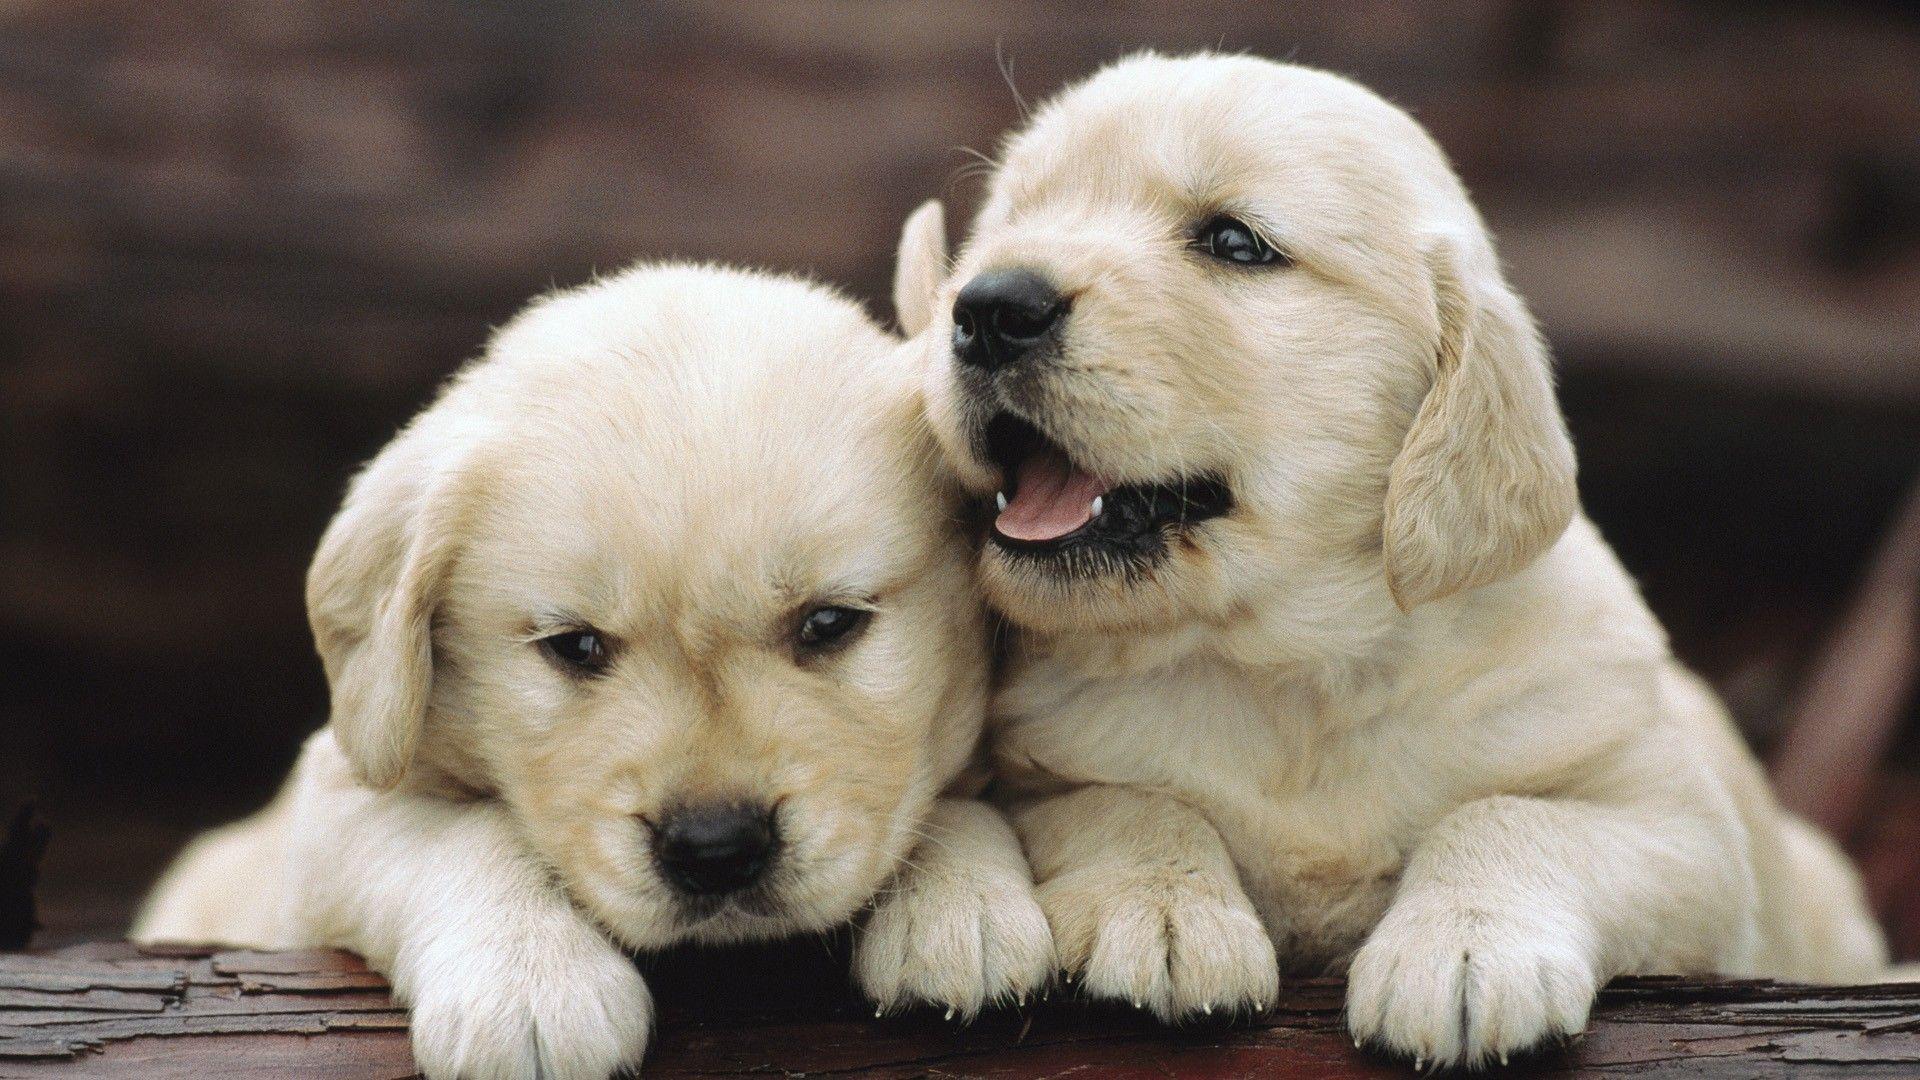 Puppies Wallpaper 2301348 Jpg Retriever Puppy Puppies Cute